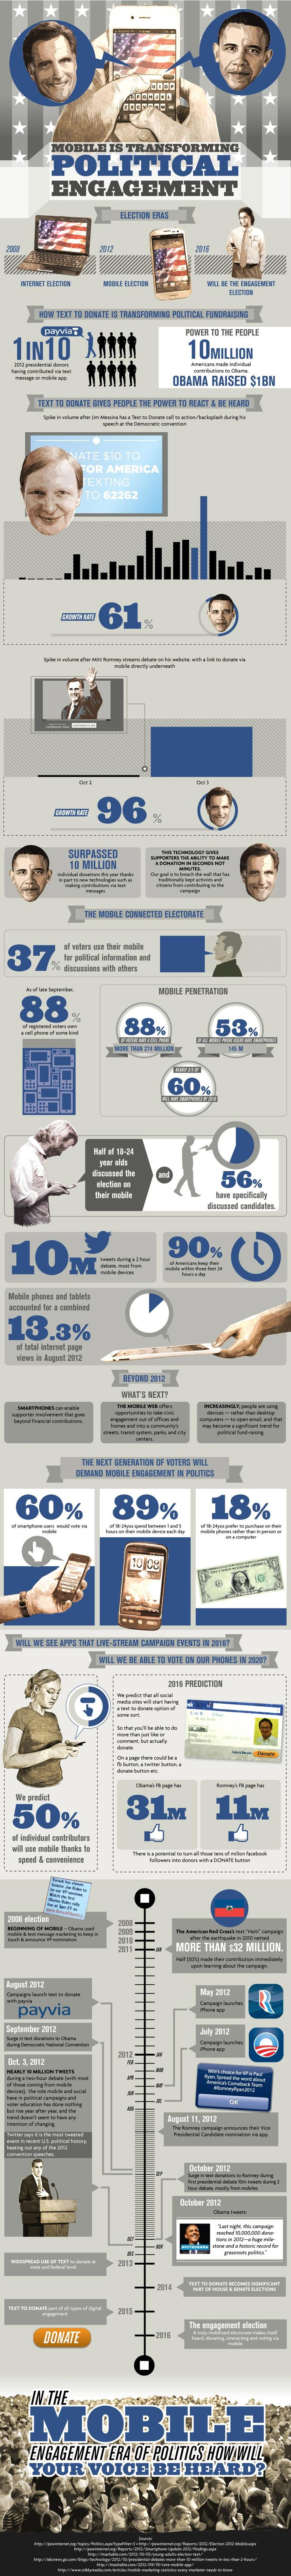 El móvil está cambiando el engagement político #infografia #infographic #marketing